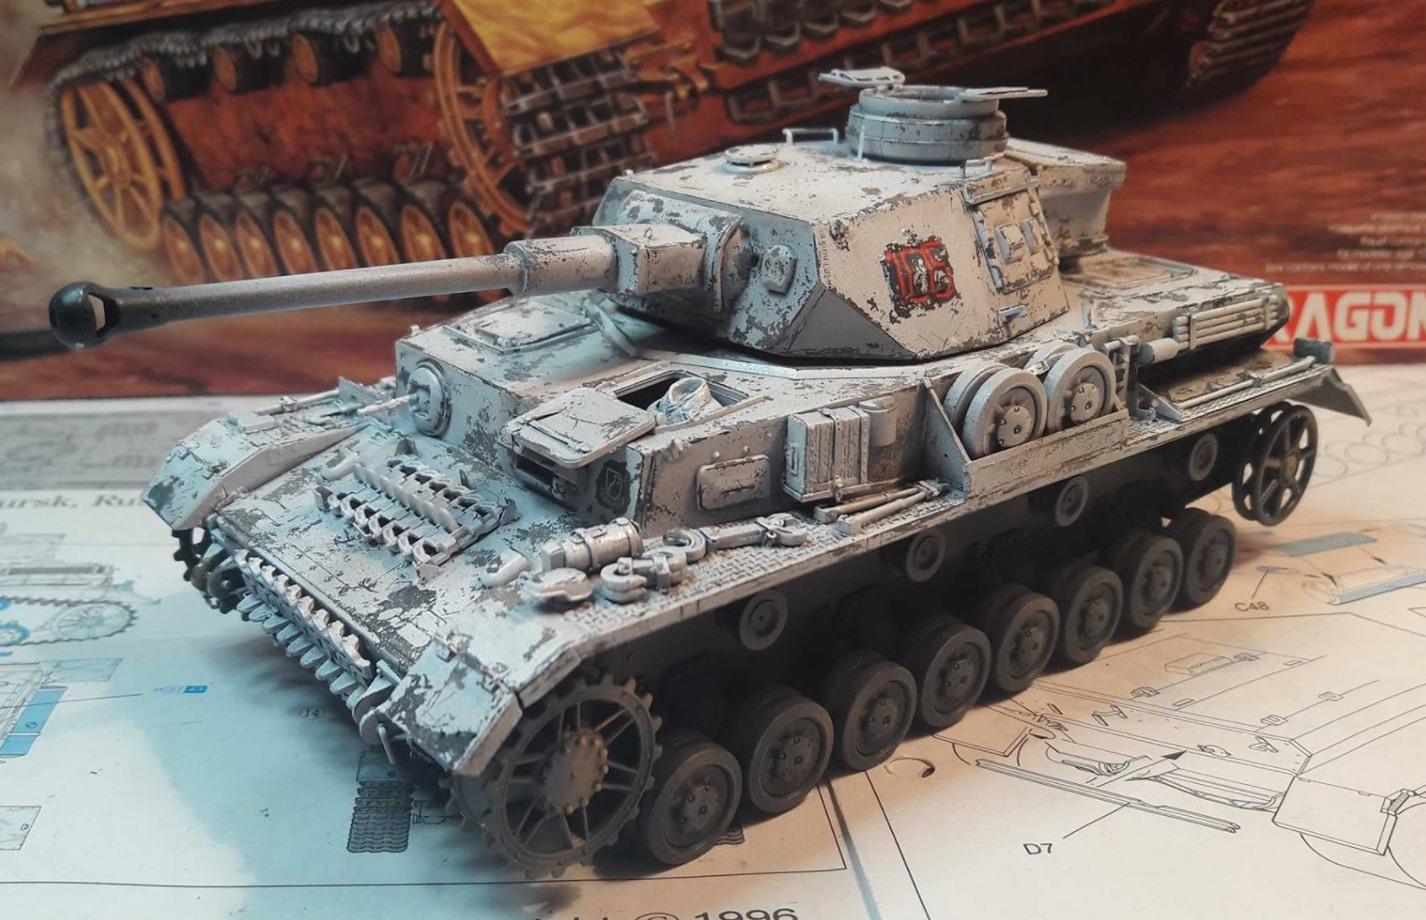 PzKpfw. IV Ausf. F2 - Dragon - Page 2 341187WhiteWash1